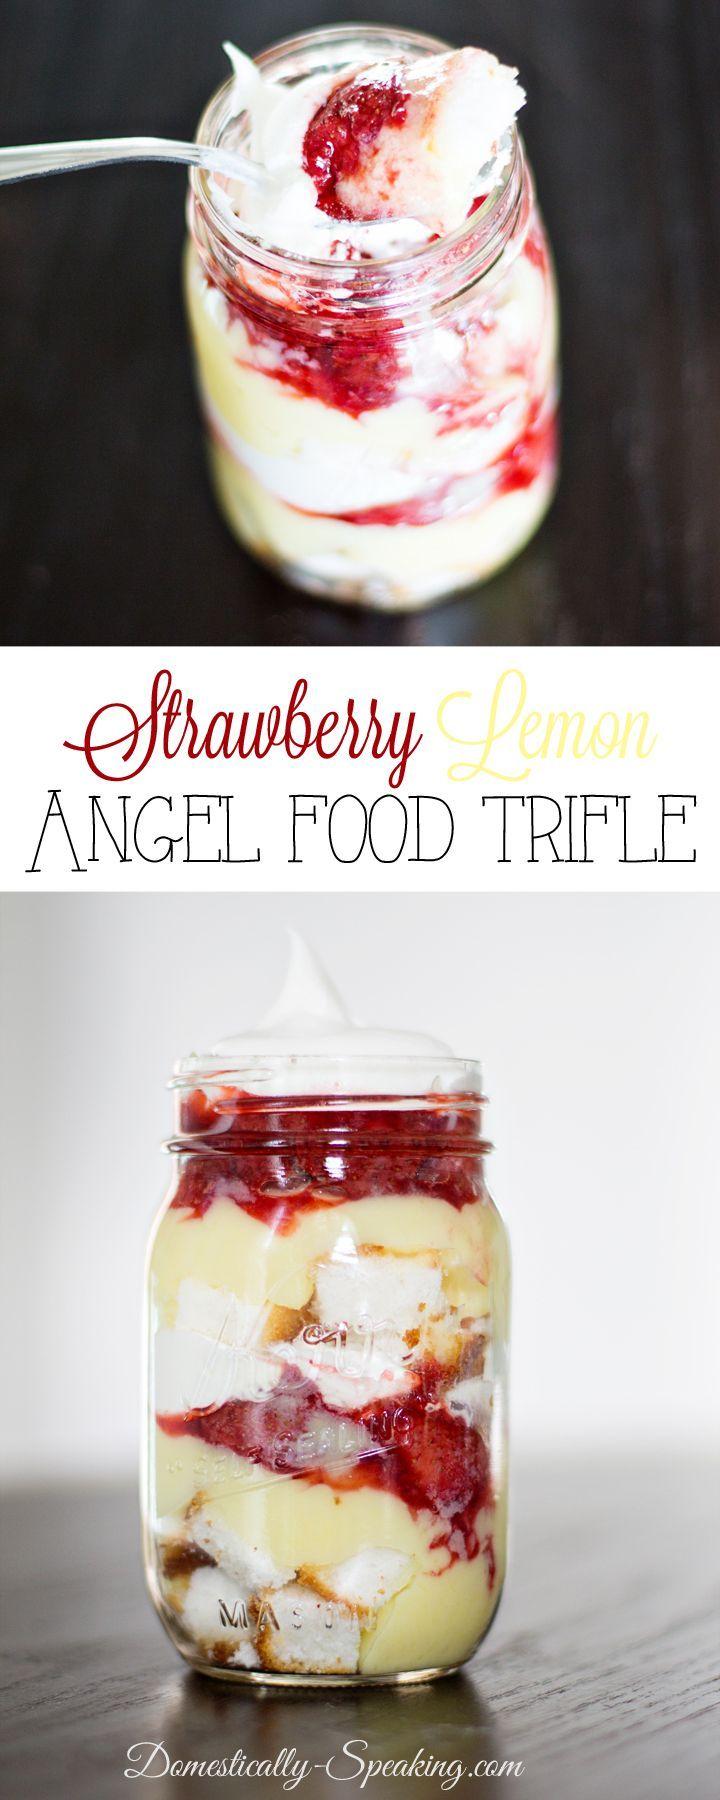 Strawberry Lemon Angel Food Trifle | 25+ Mason Jar Eats